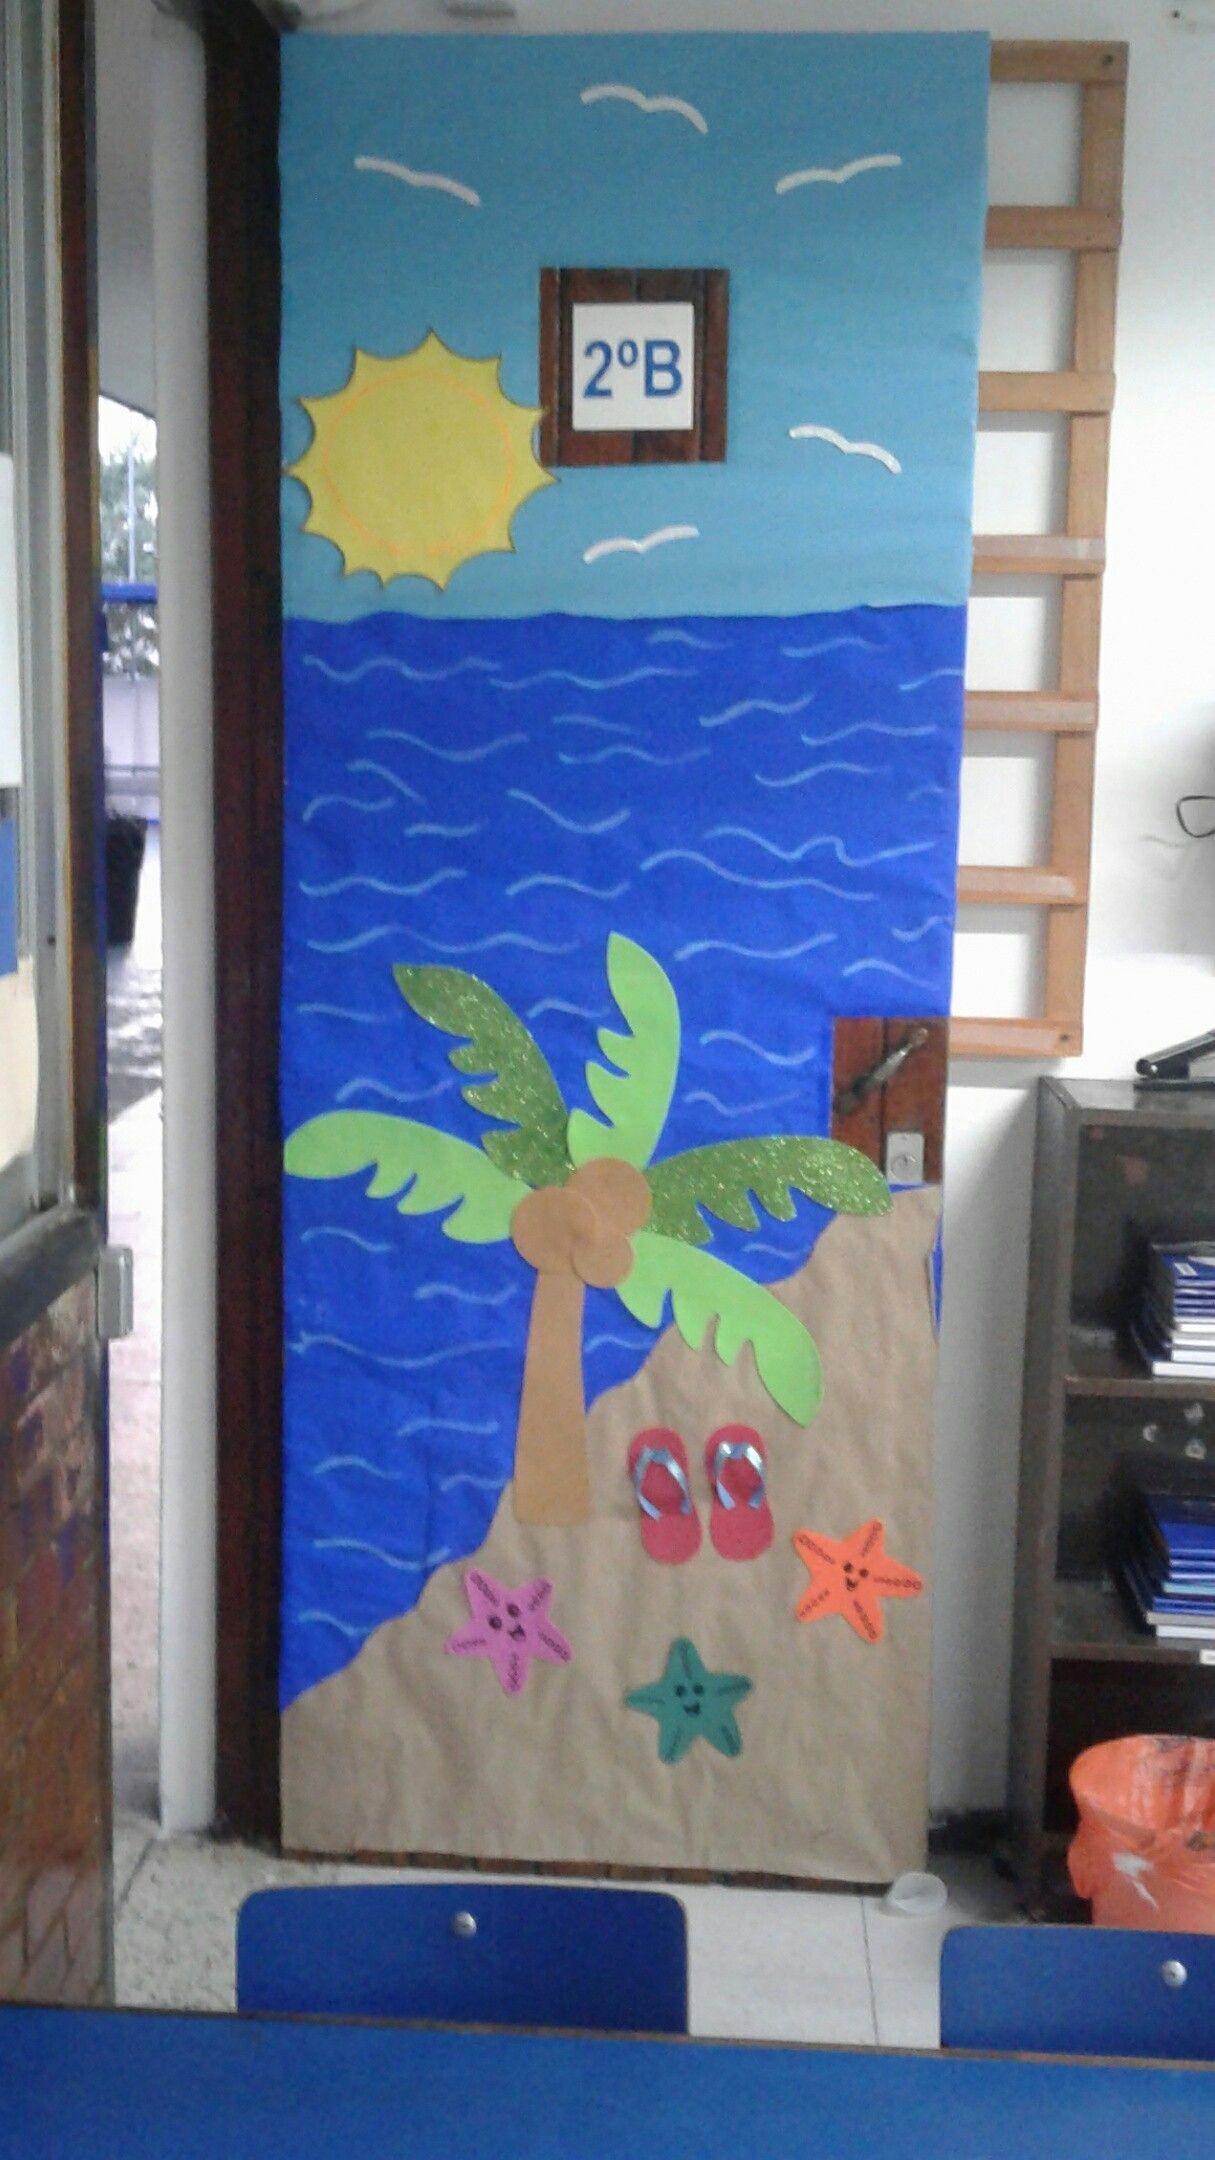 Decoraci n puerta sal n playa sal n de clases for Decoracion de puertas de salones